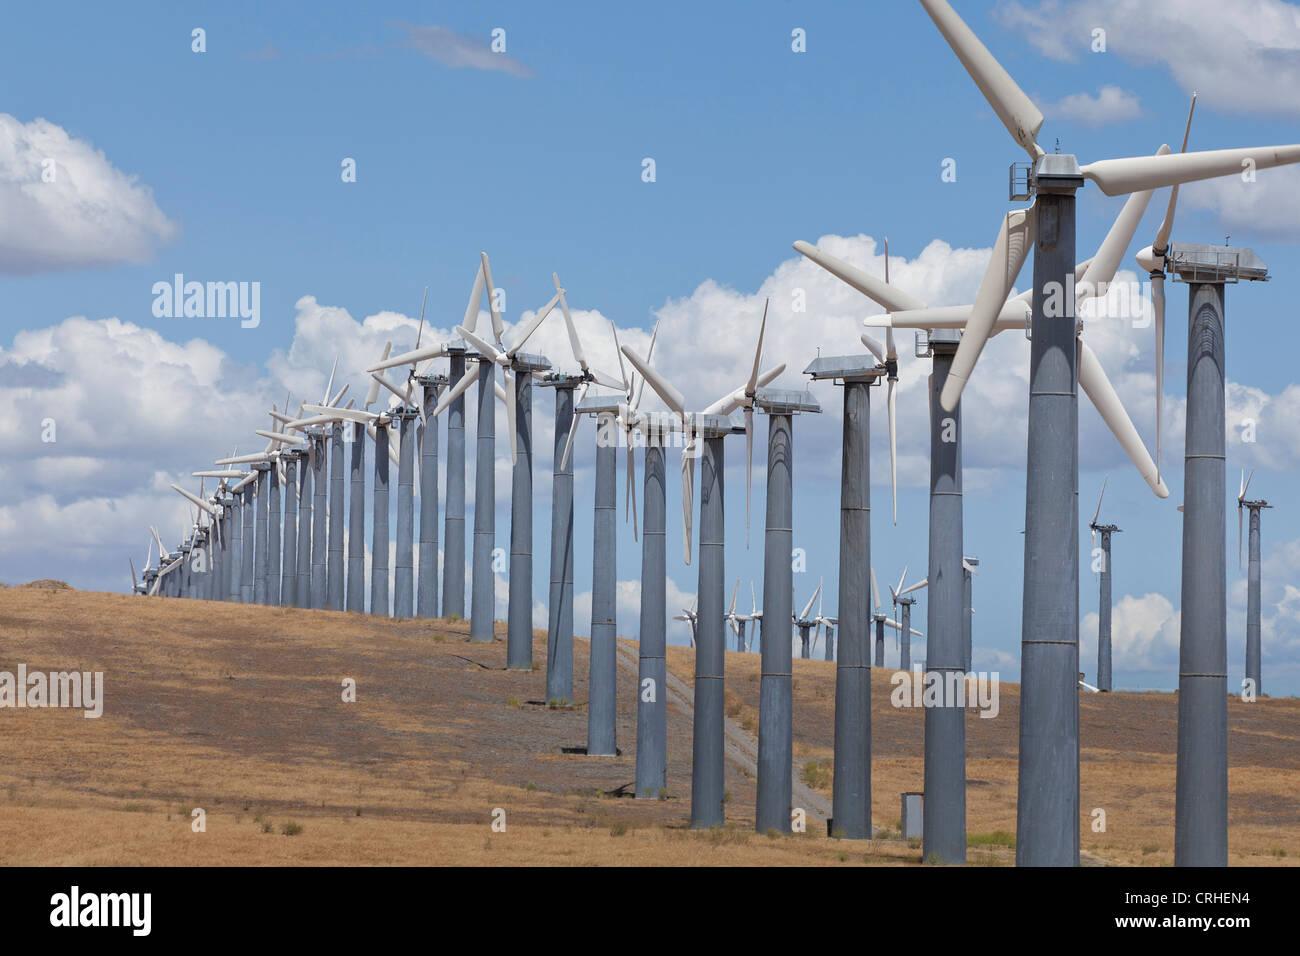 Wind turbines at wind farm - Altamont Pass, California USA - Stock Image